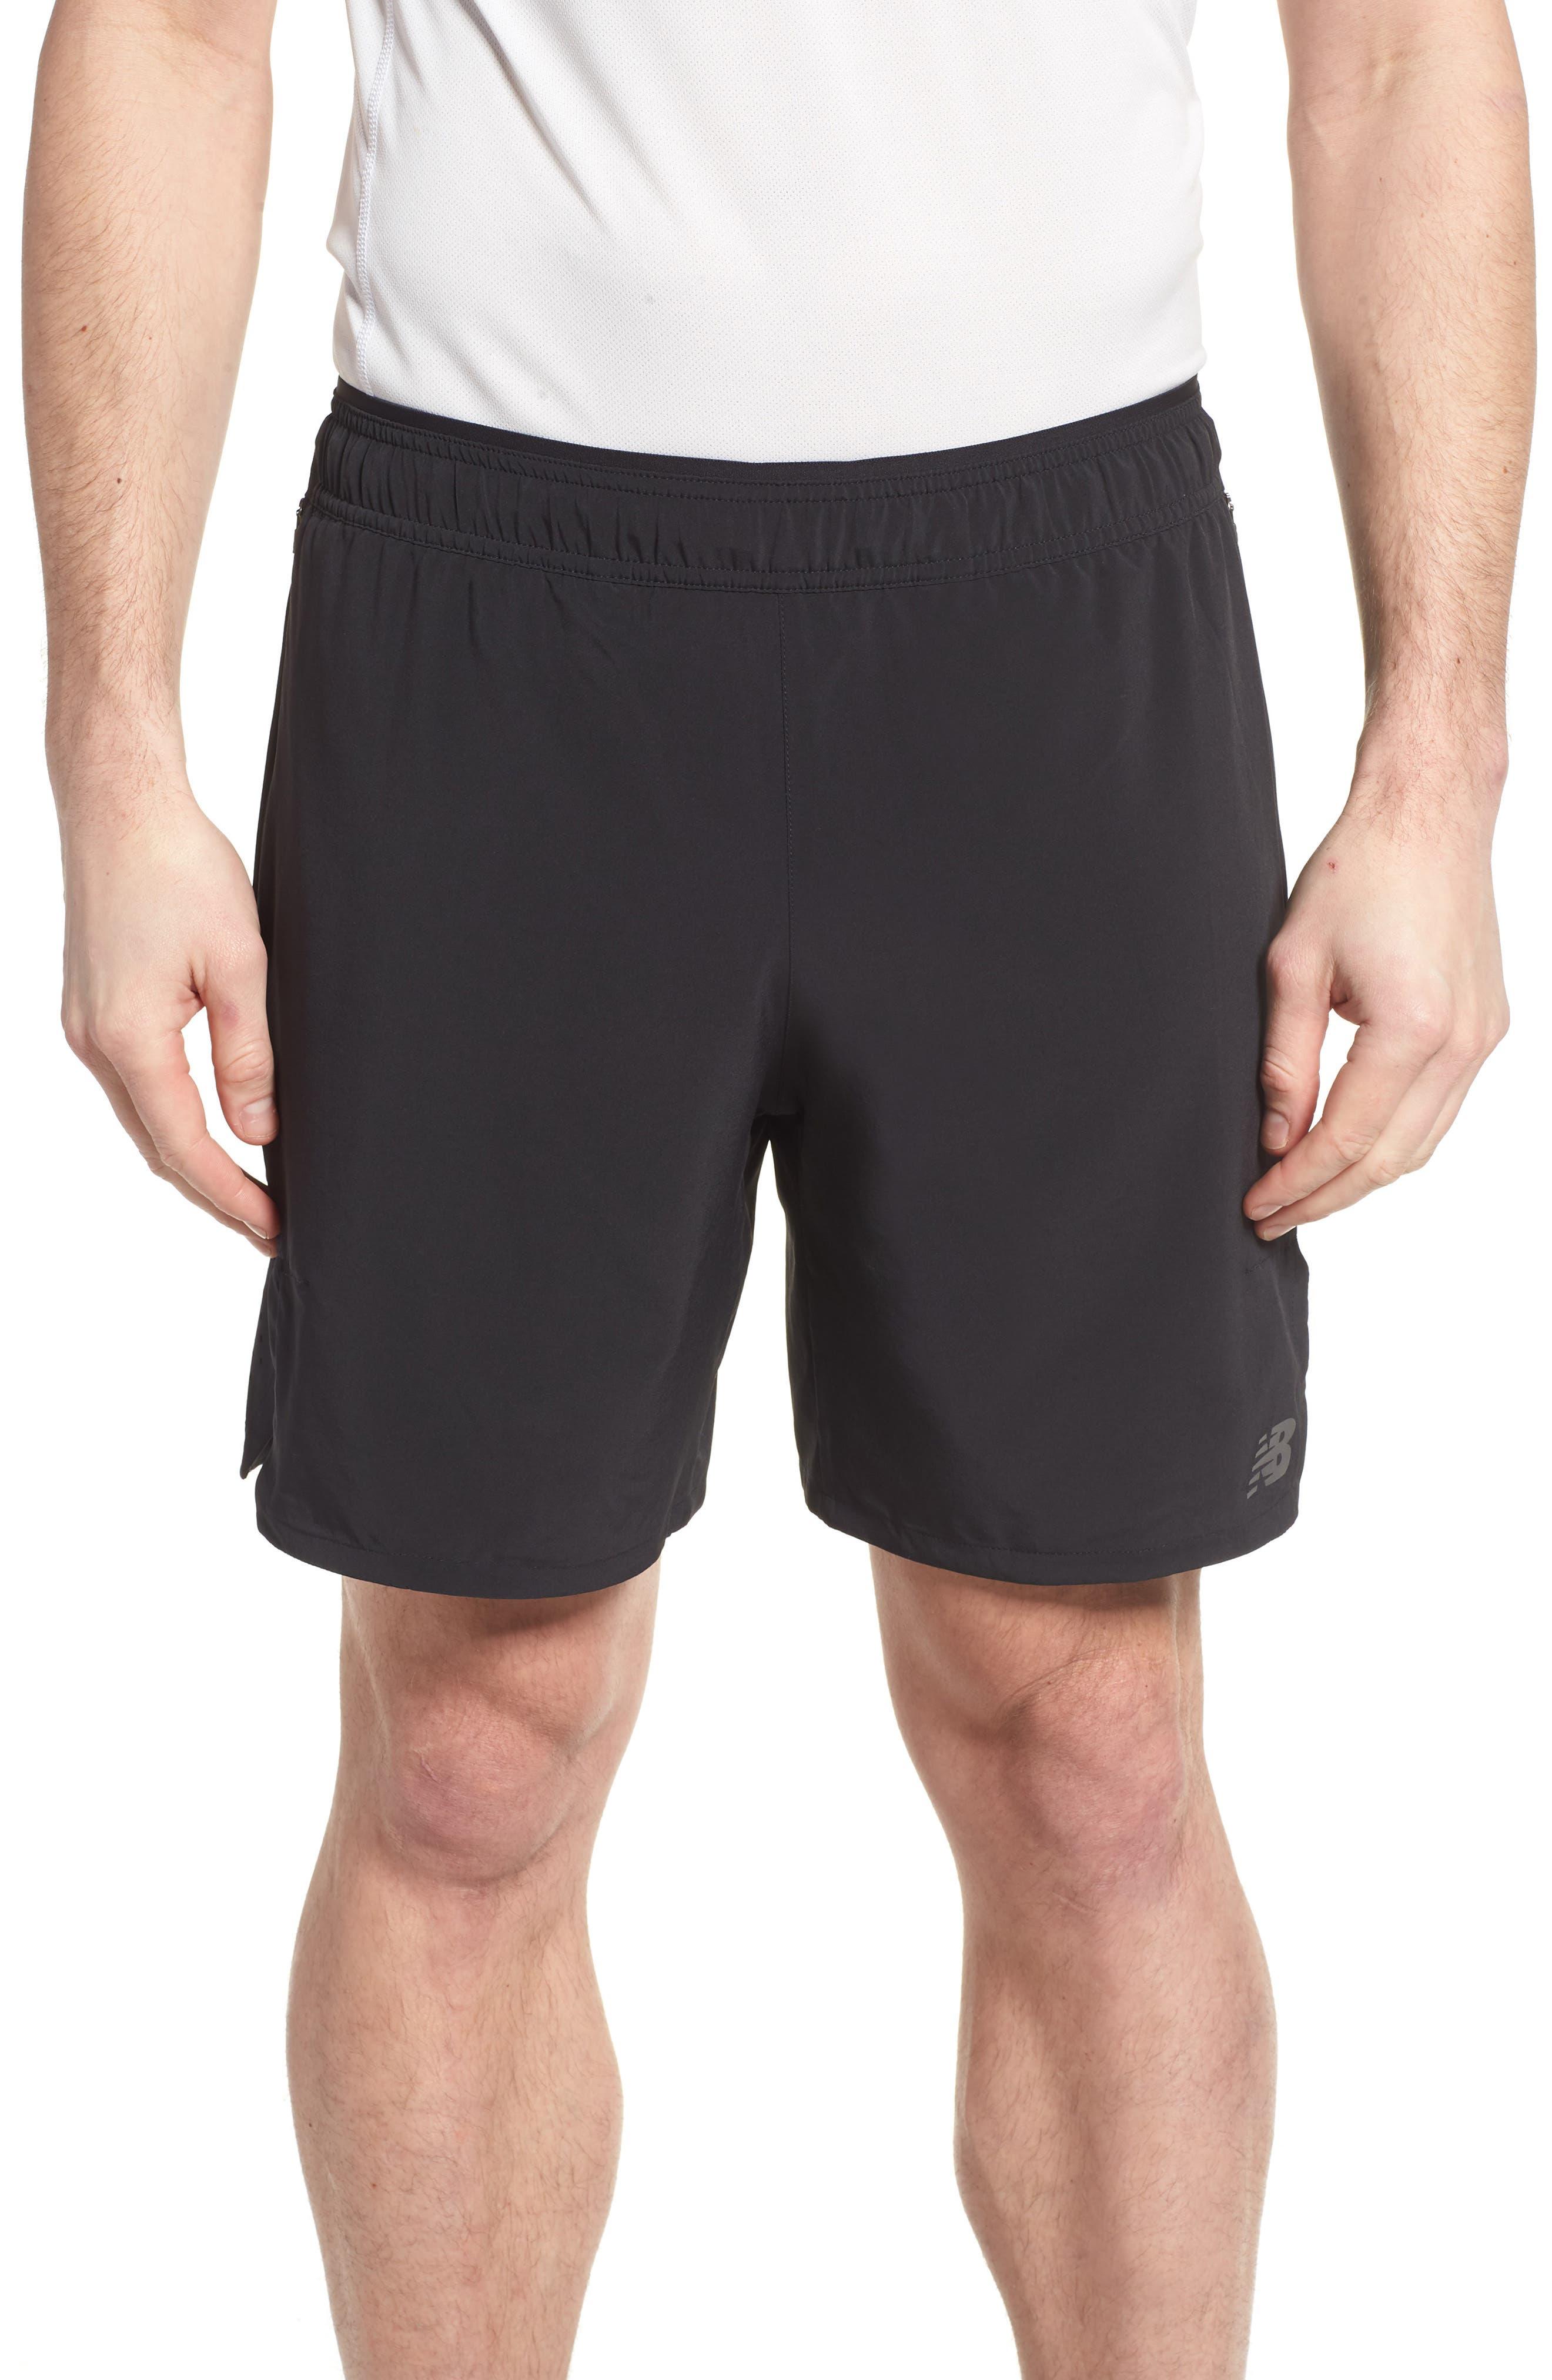 New Balance Transform 2-In-1 Shorts, Black